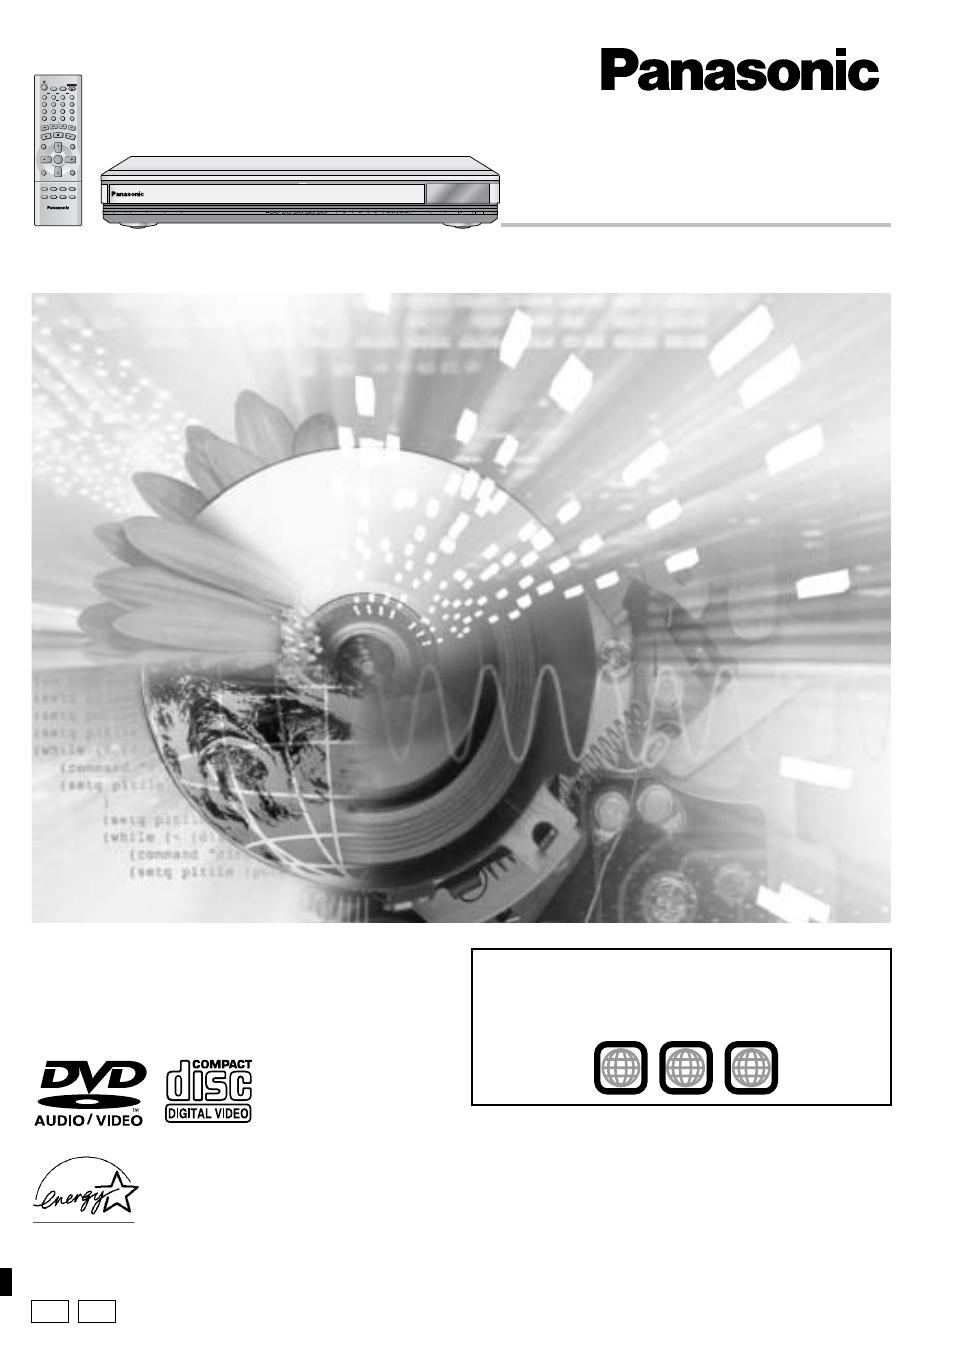 panasonic dvd player instructions